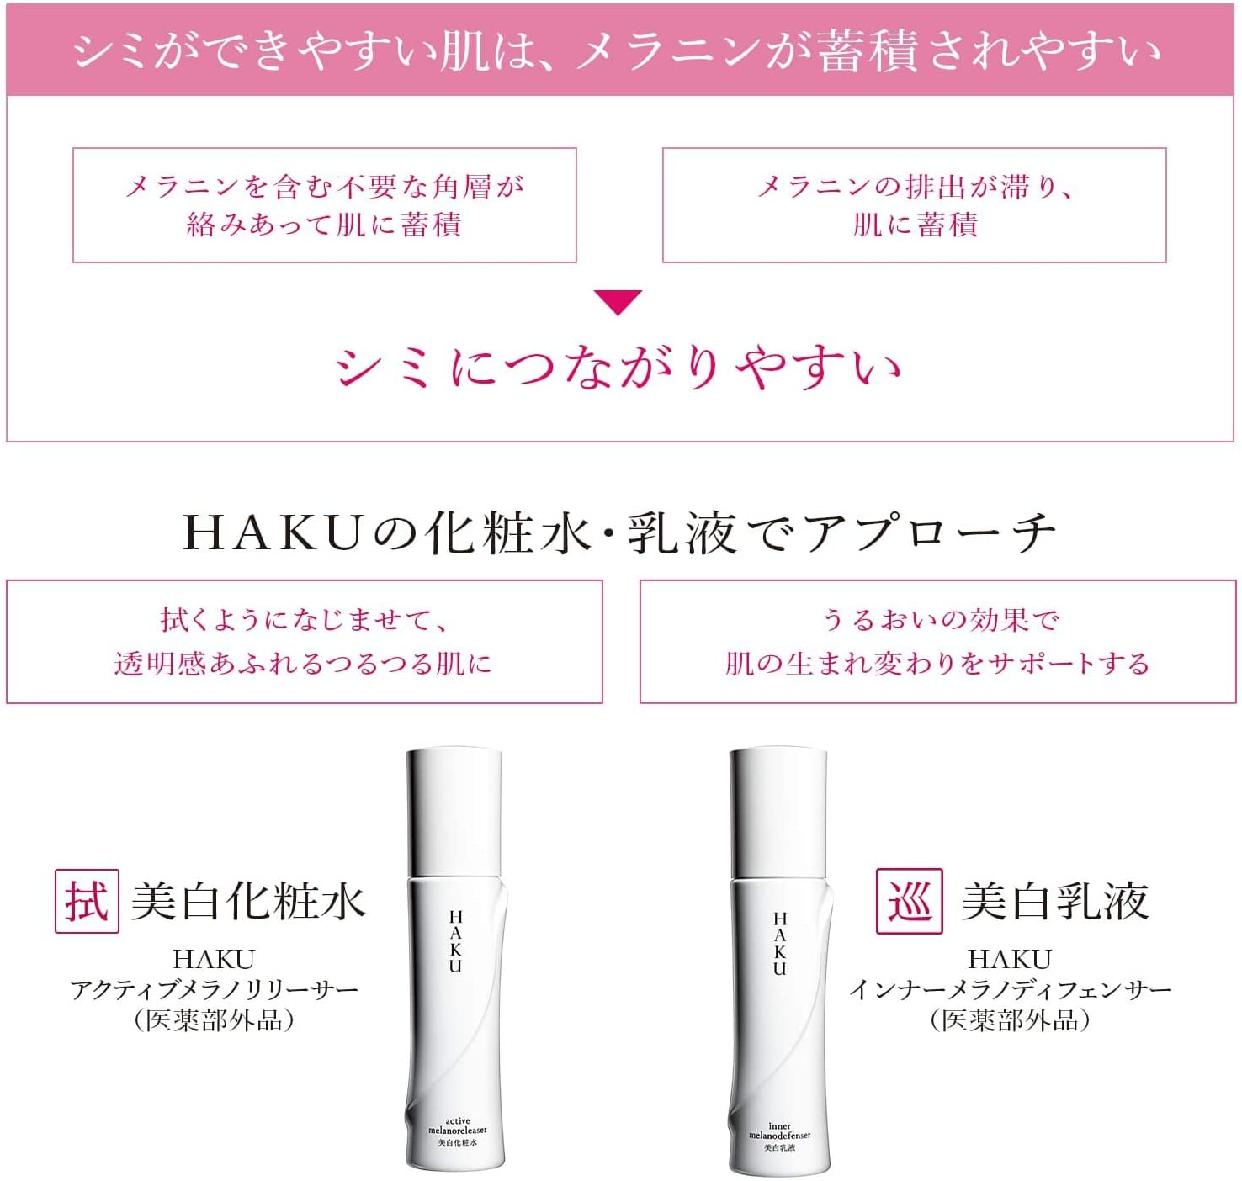 HAKU(ハク) アクティブメラノリリーサー 美白化粧水の商品画像7